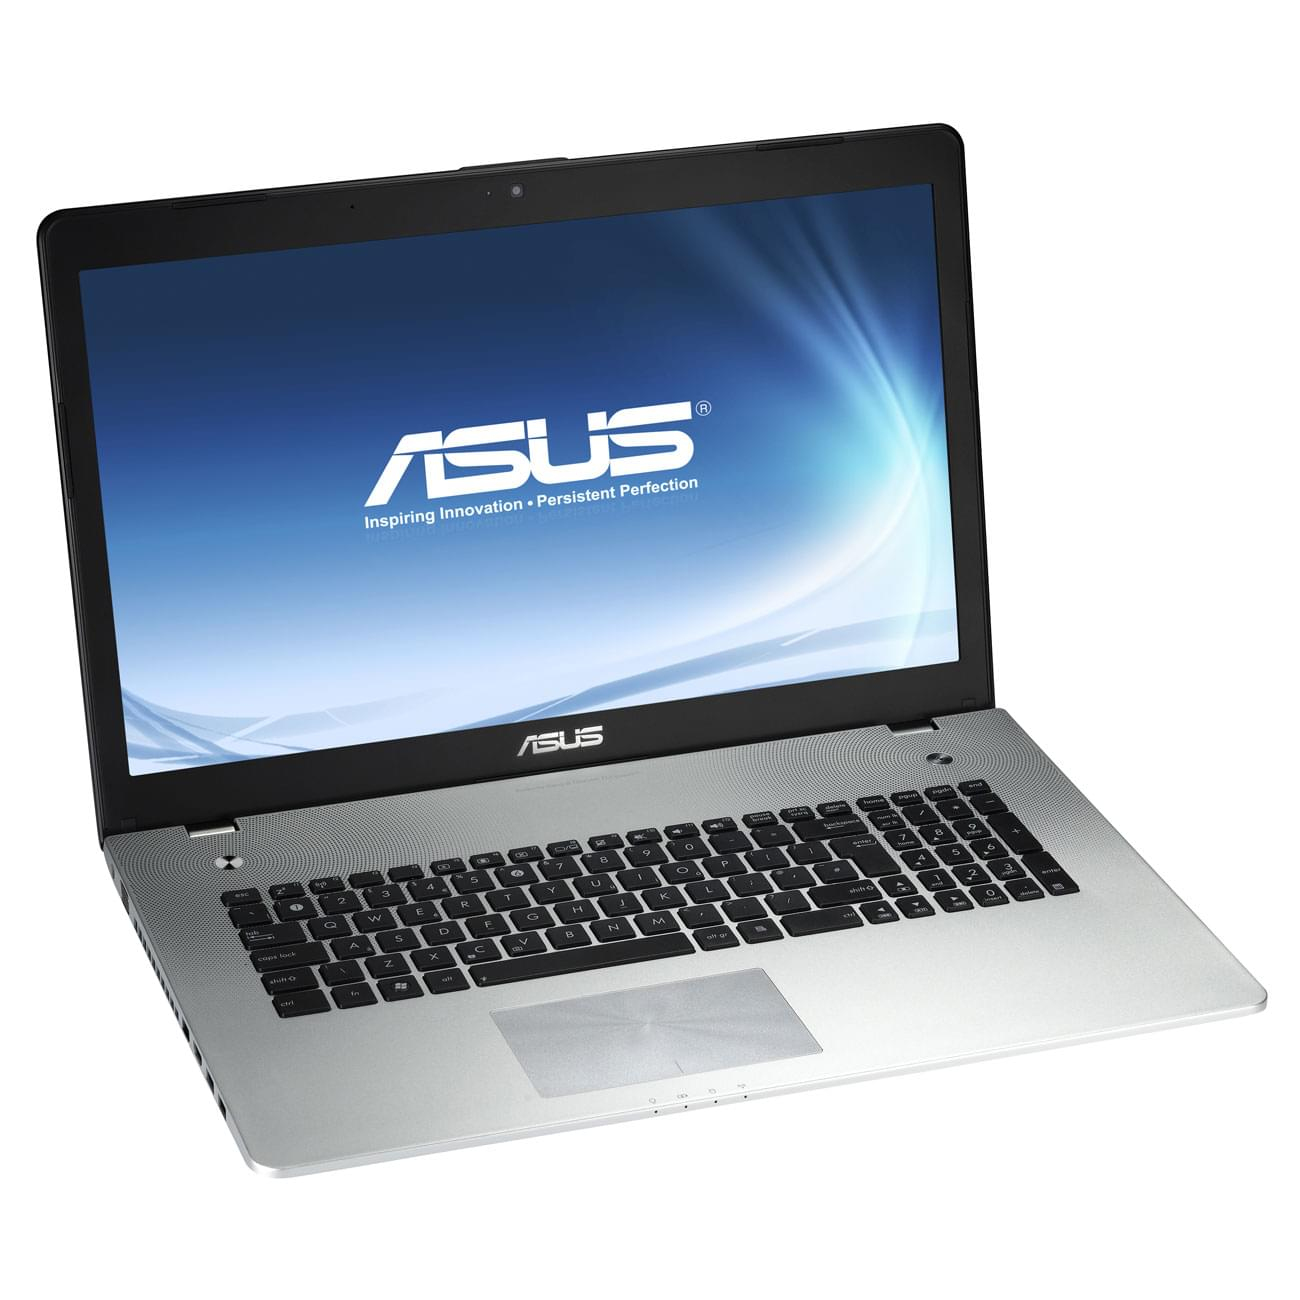 Asus N76VZ-V4G-T1153H (N76VZ-V4G-T1153H) - Achat / Vente PC portable sur Cybertek.fr - 0